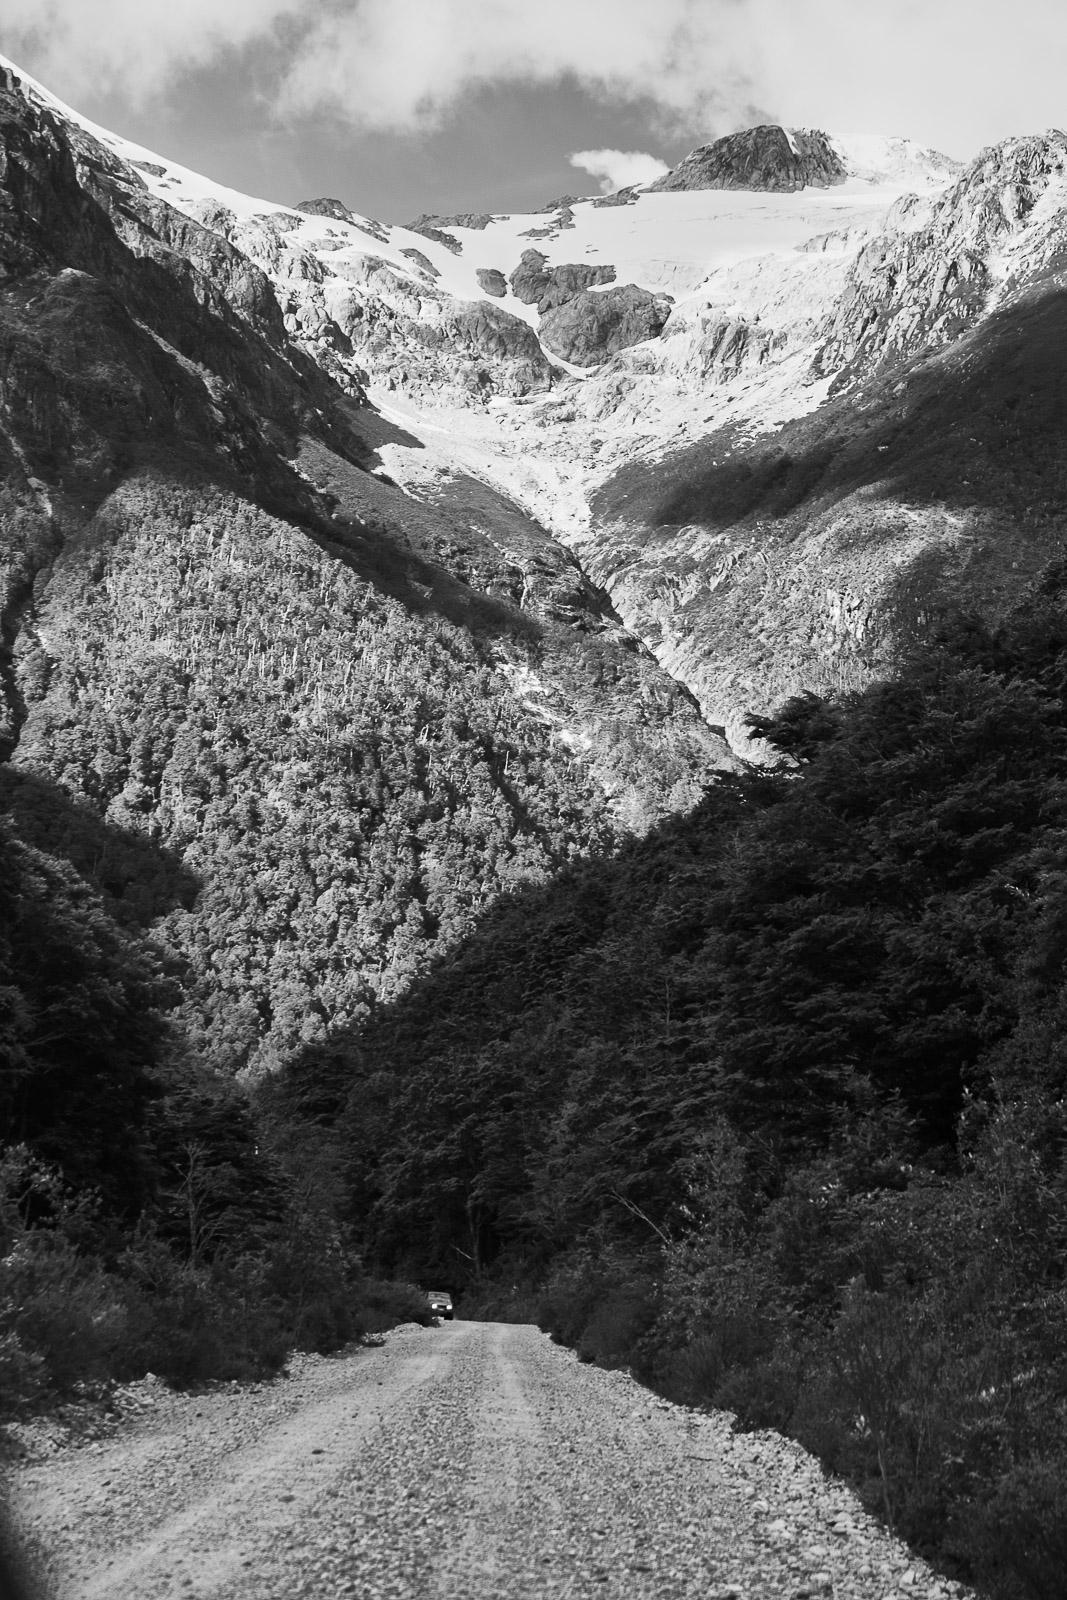 Carretera Austral. Aysén. - Aysén - Eduardo Cerda. Fotografías de Aysén.Chile.